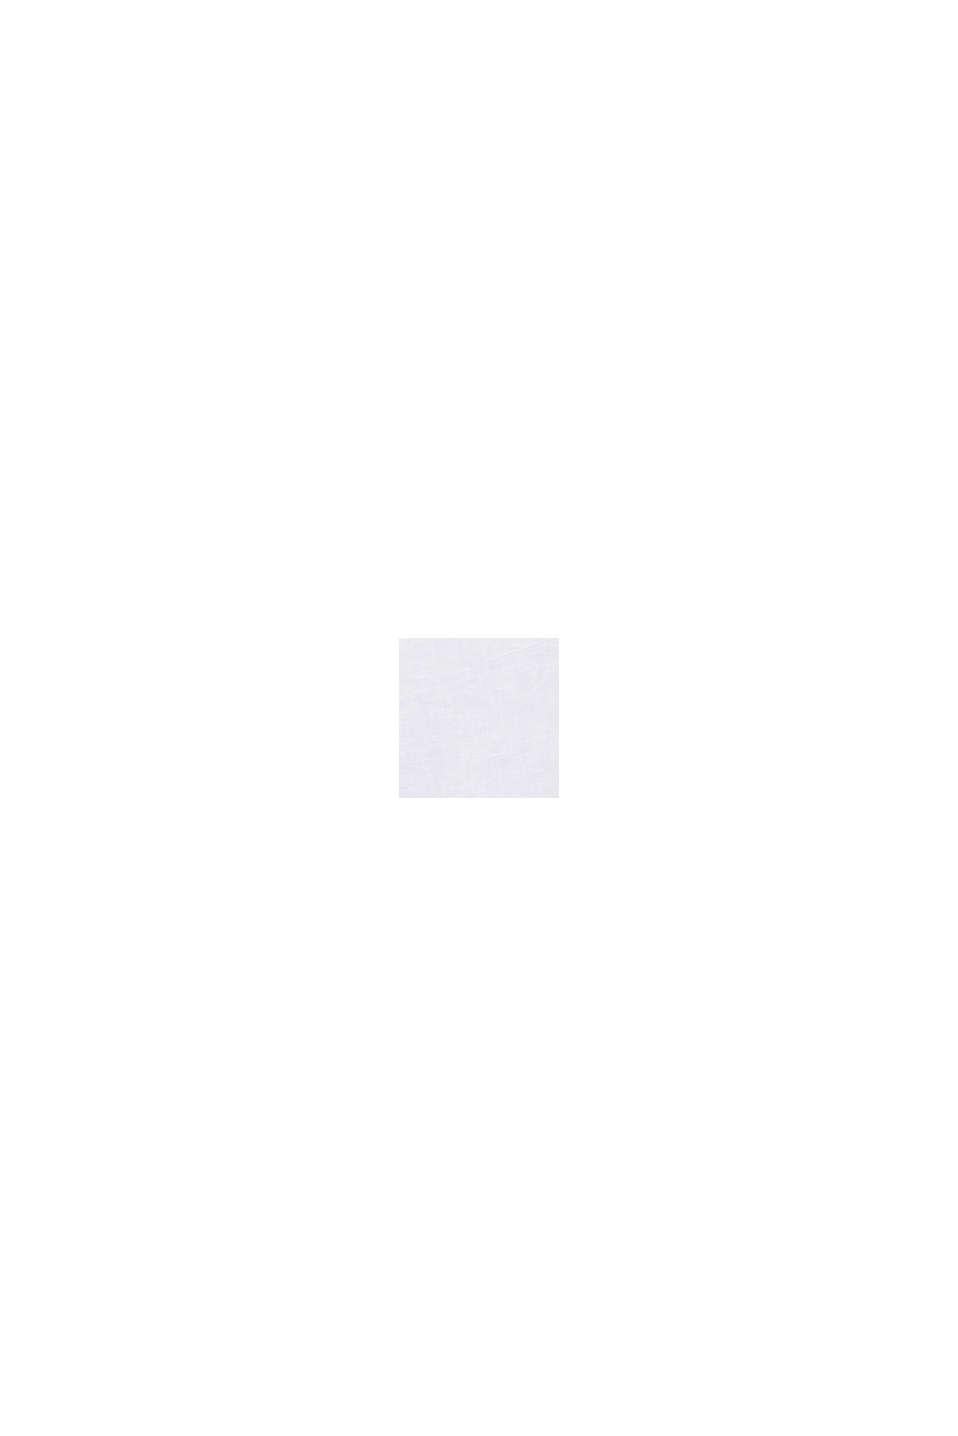 I linne: Culottebyxa i baslook, WHITE, swatch